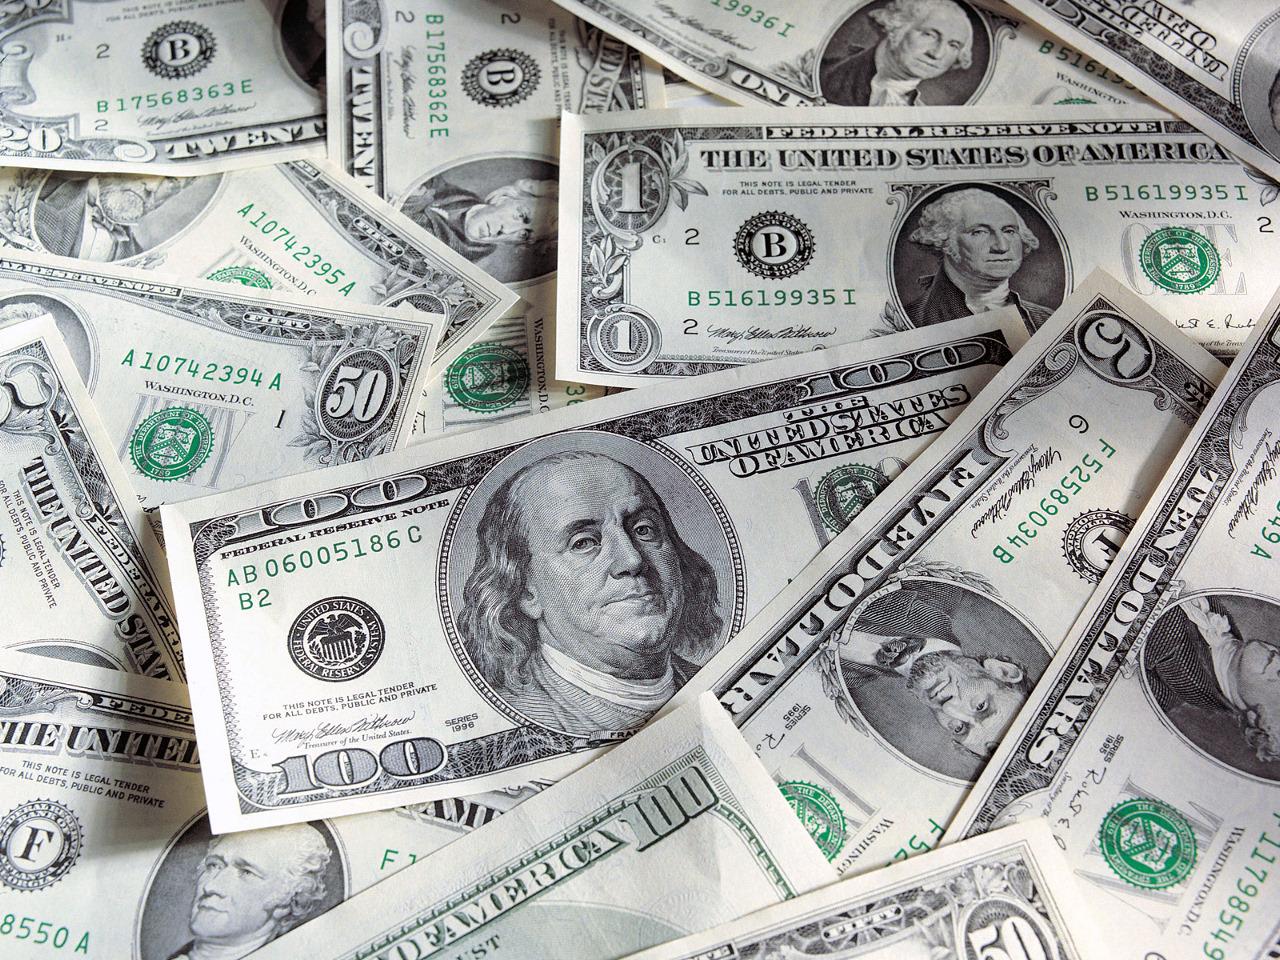 us-dollars-12-627ashgcdr-1280x960_1365766113.jpg